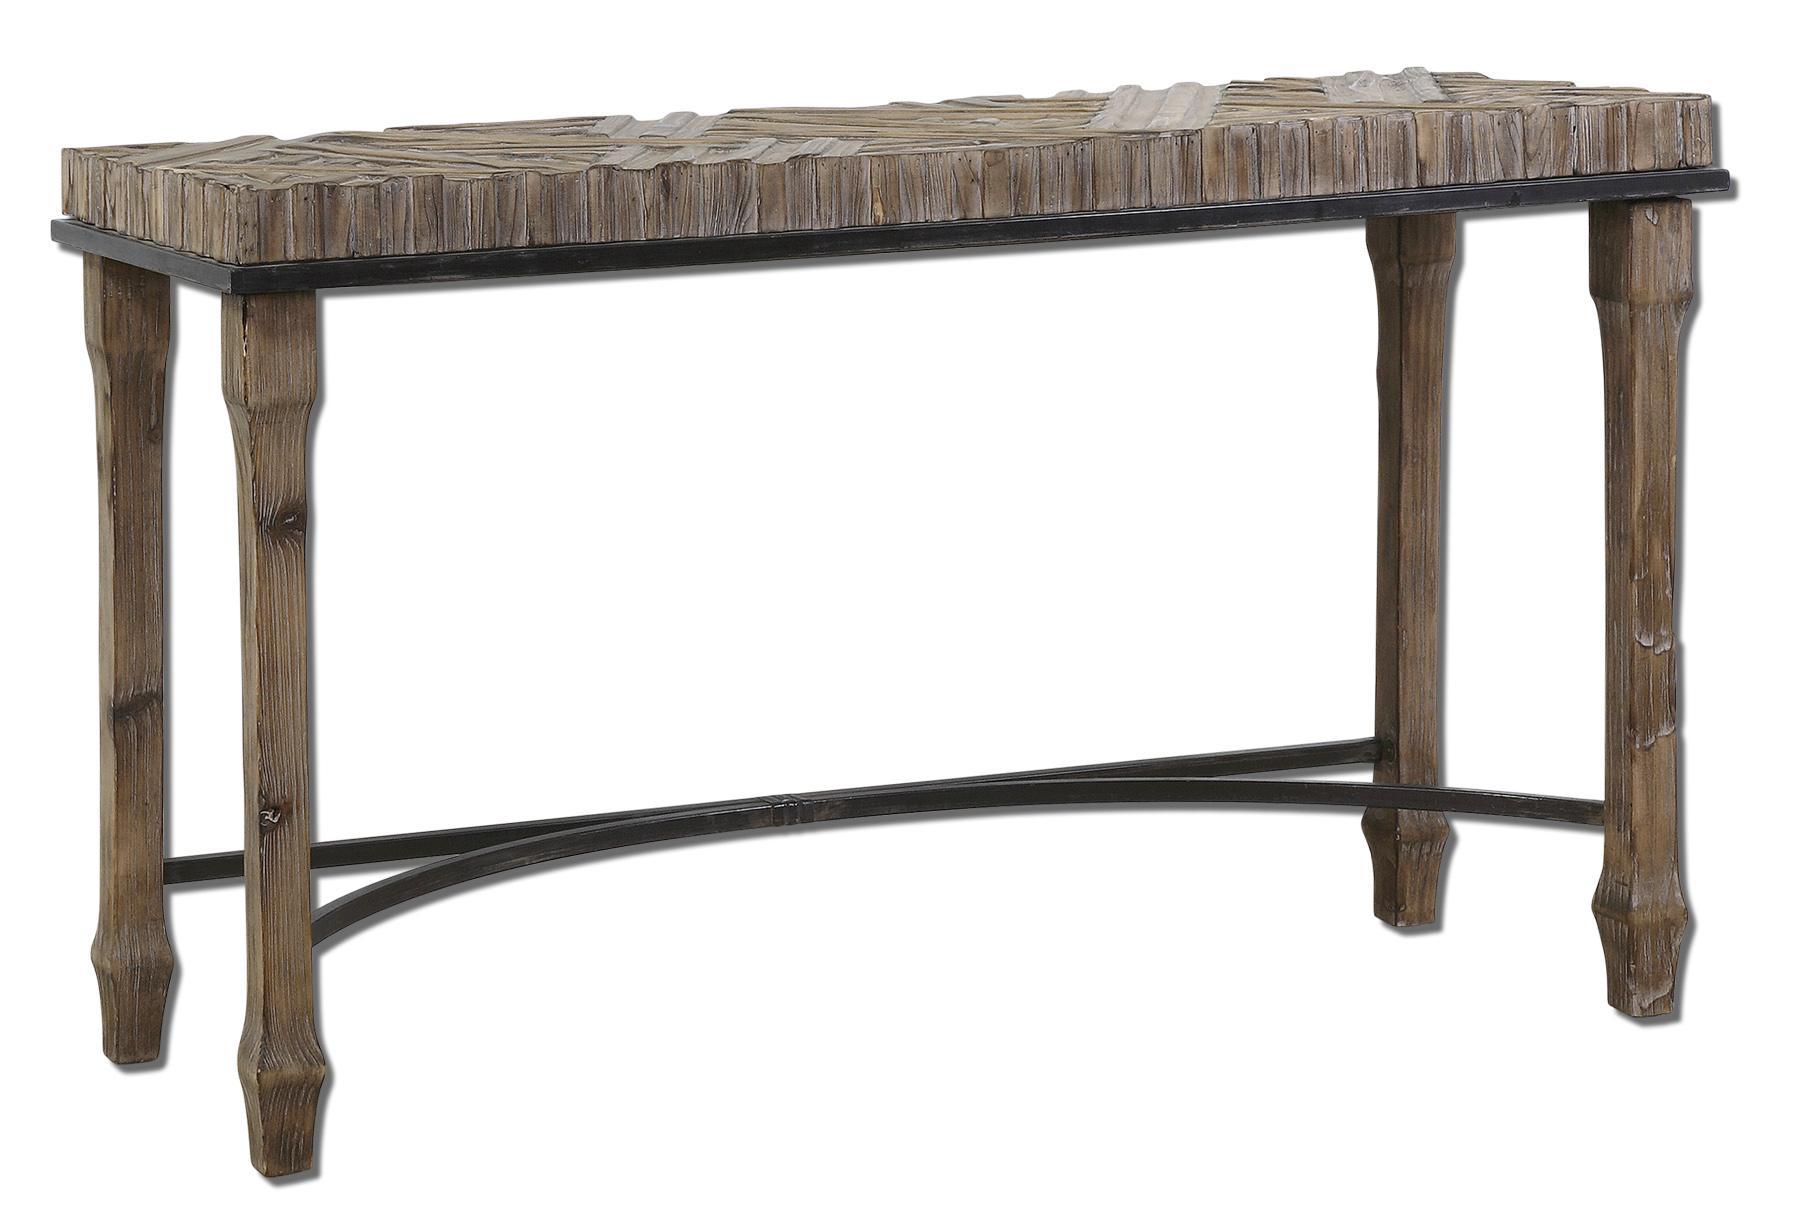 Uttermost Accent Furniture Tehama Console - Item Number: 24266